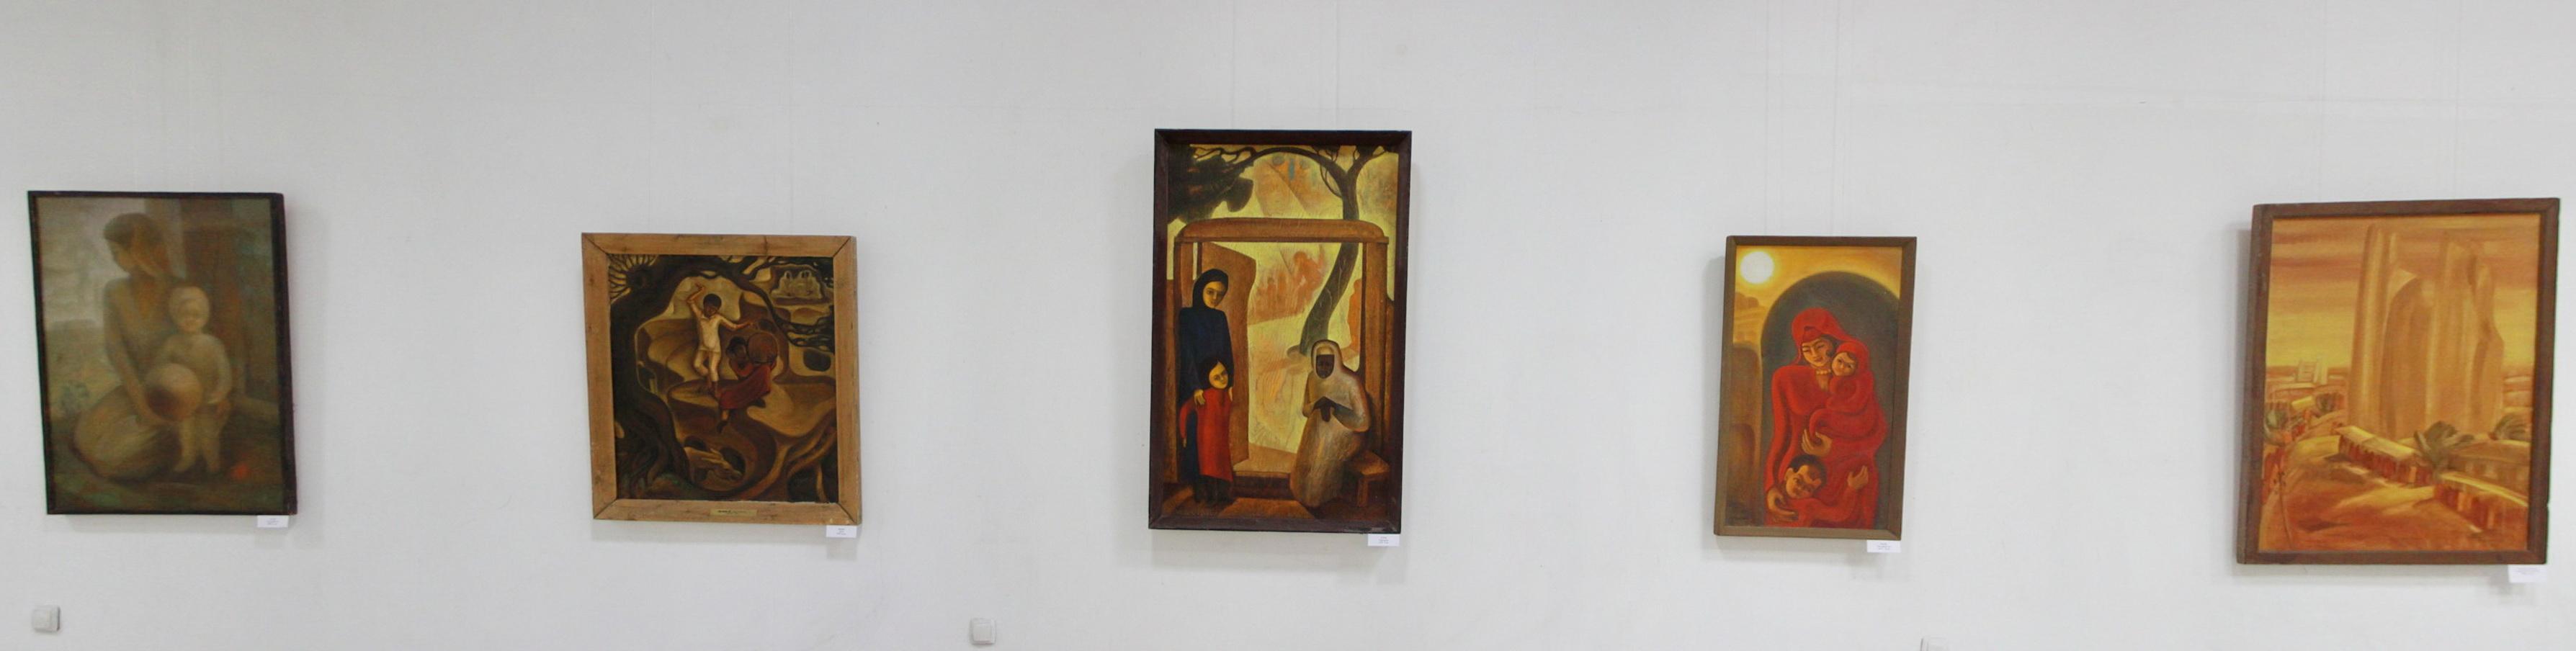 Аслиддин Исаев. Экспозиция картин. 2019 ЦВЗ (3)